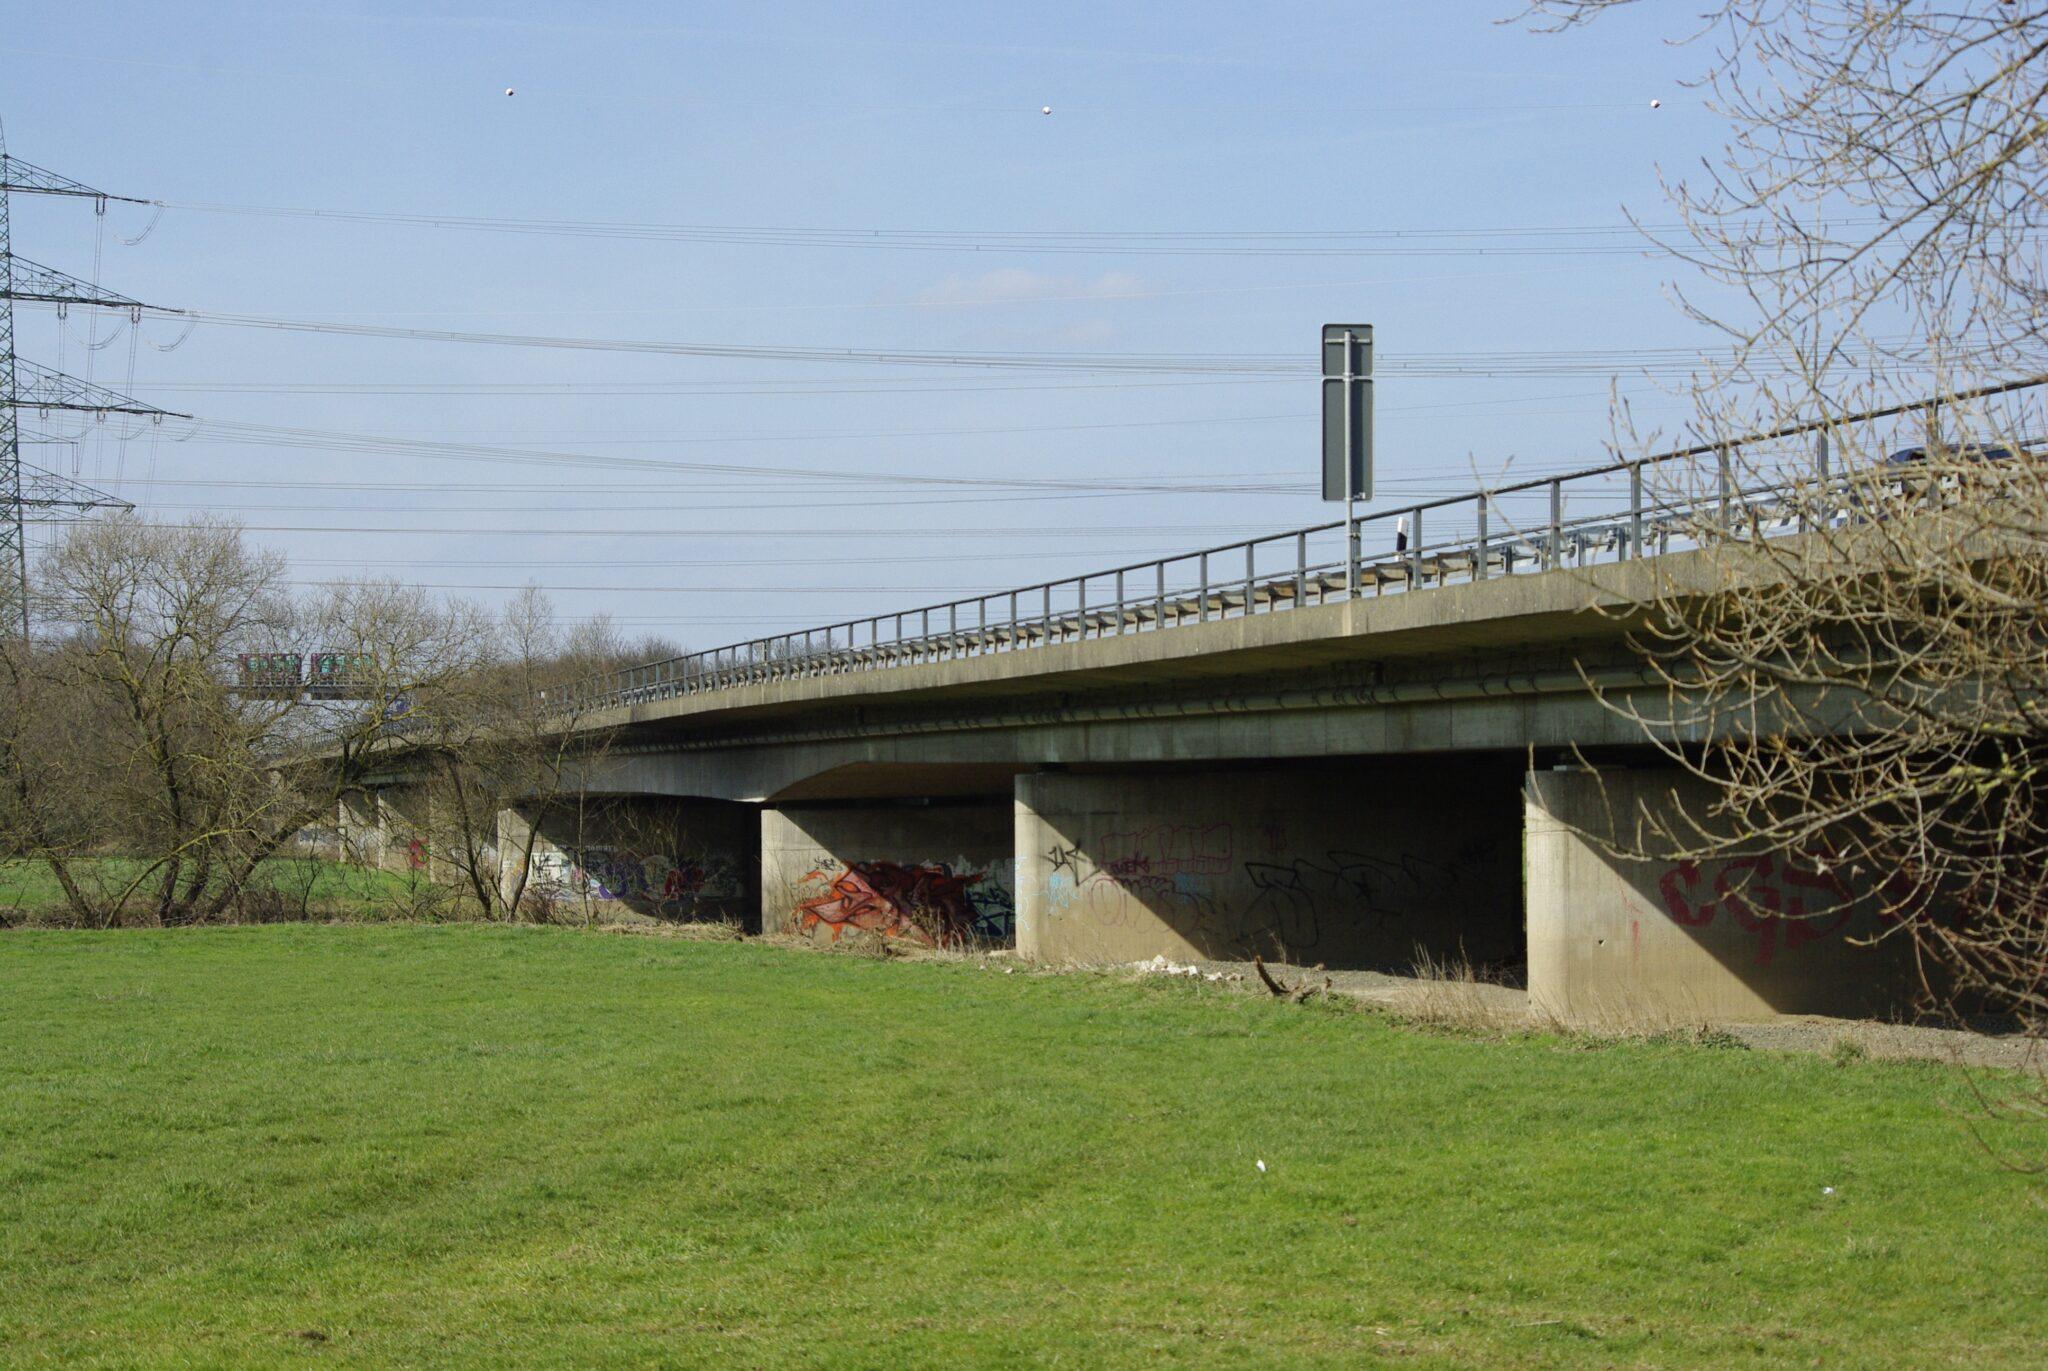 Bruecke Sieg A59 scaled